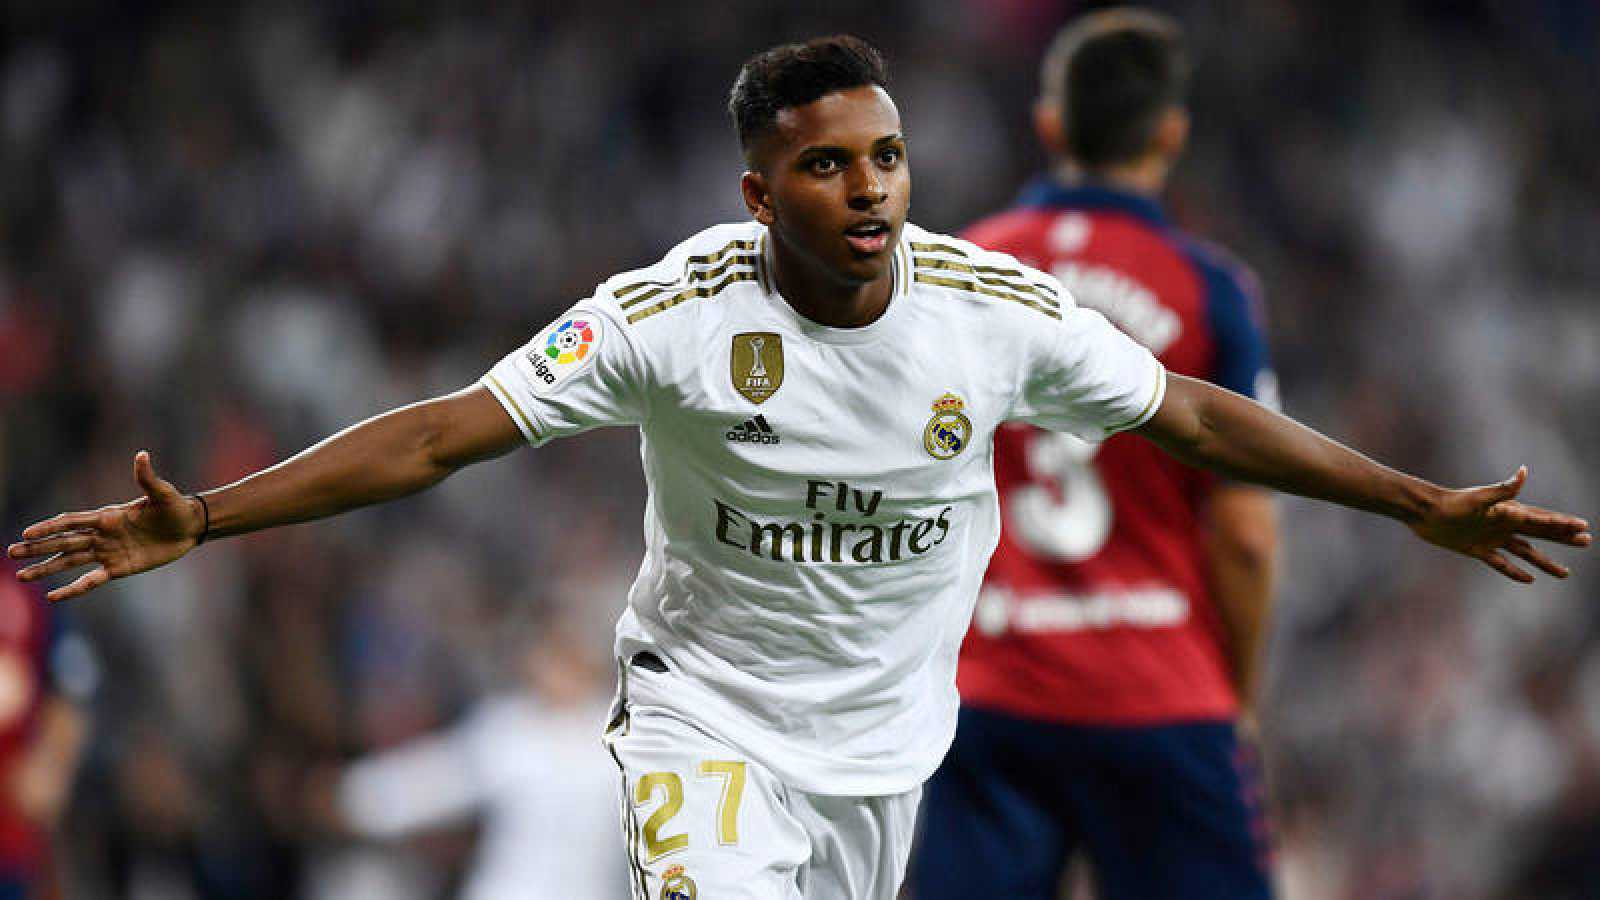 El brasileño Rodrygo celebra el segundo gol del Madrid ante Osasuna.